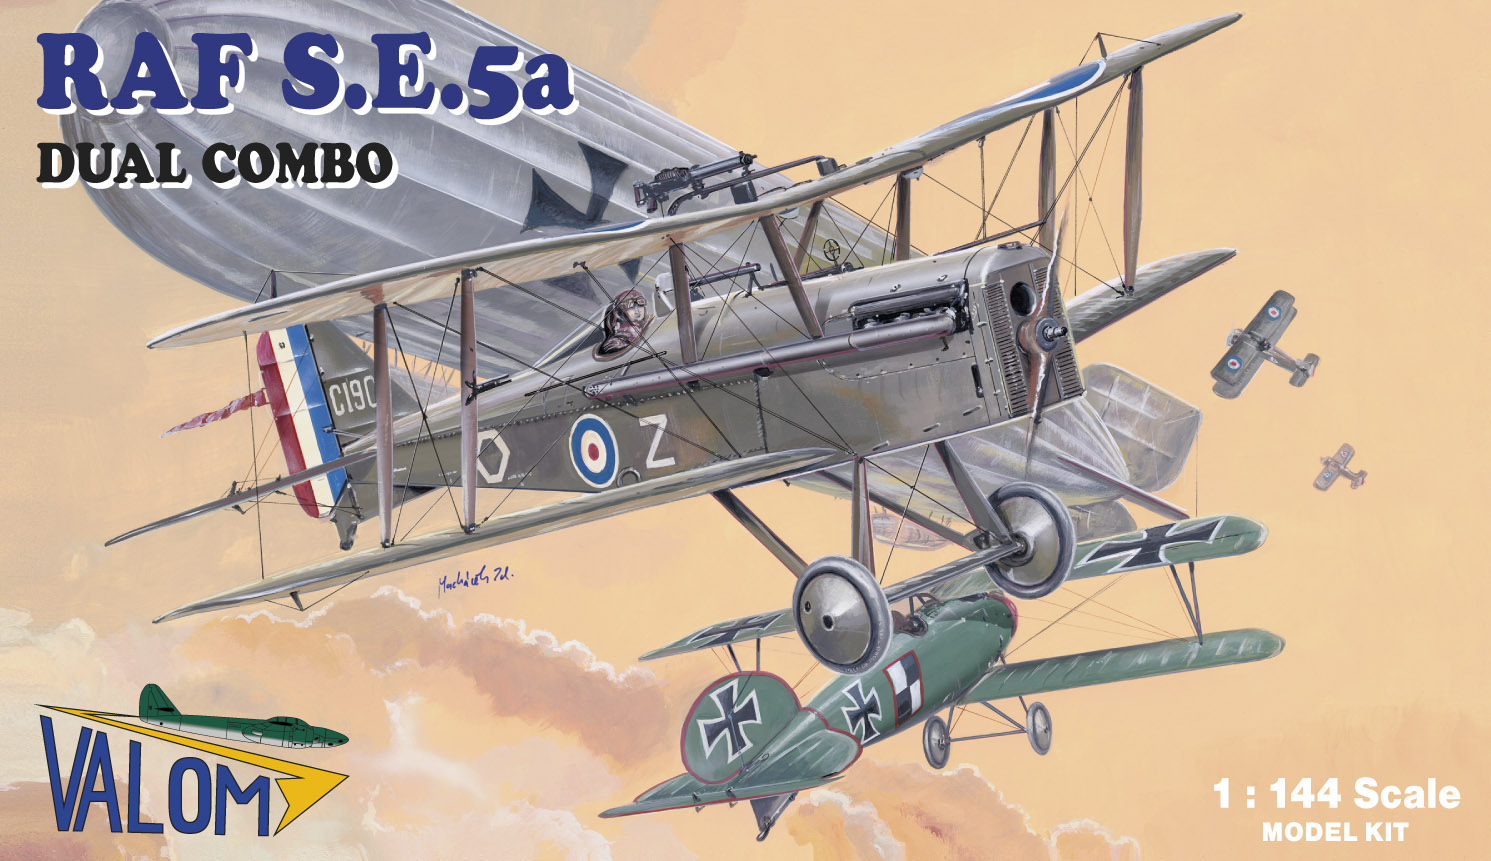 Valom RAF SE5a (dual combo)